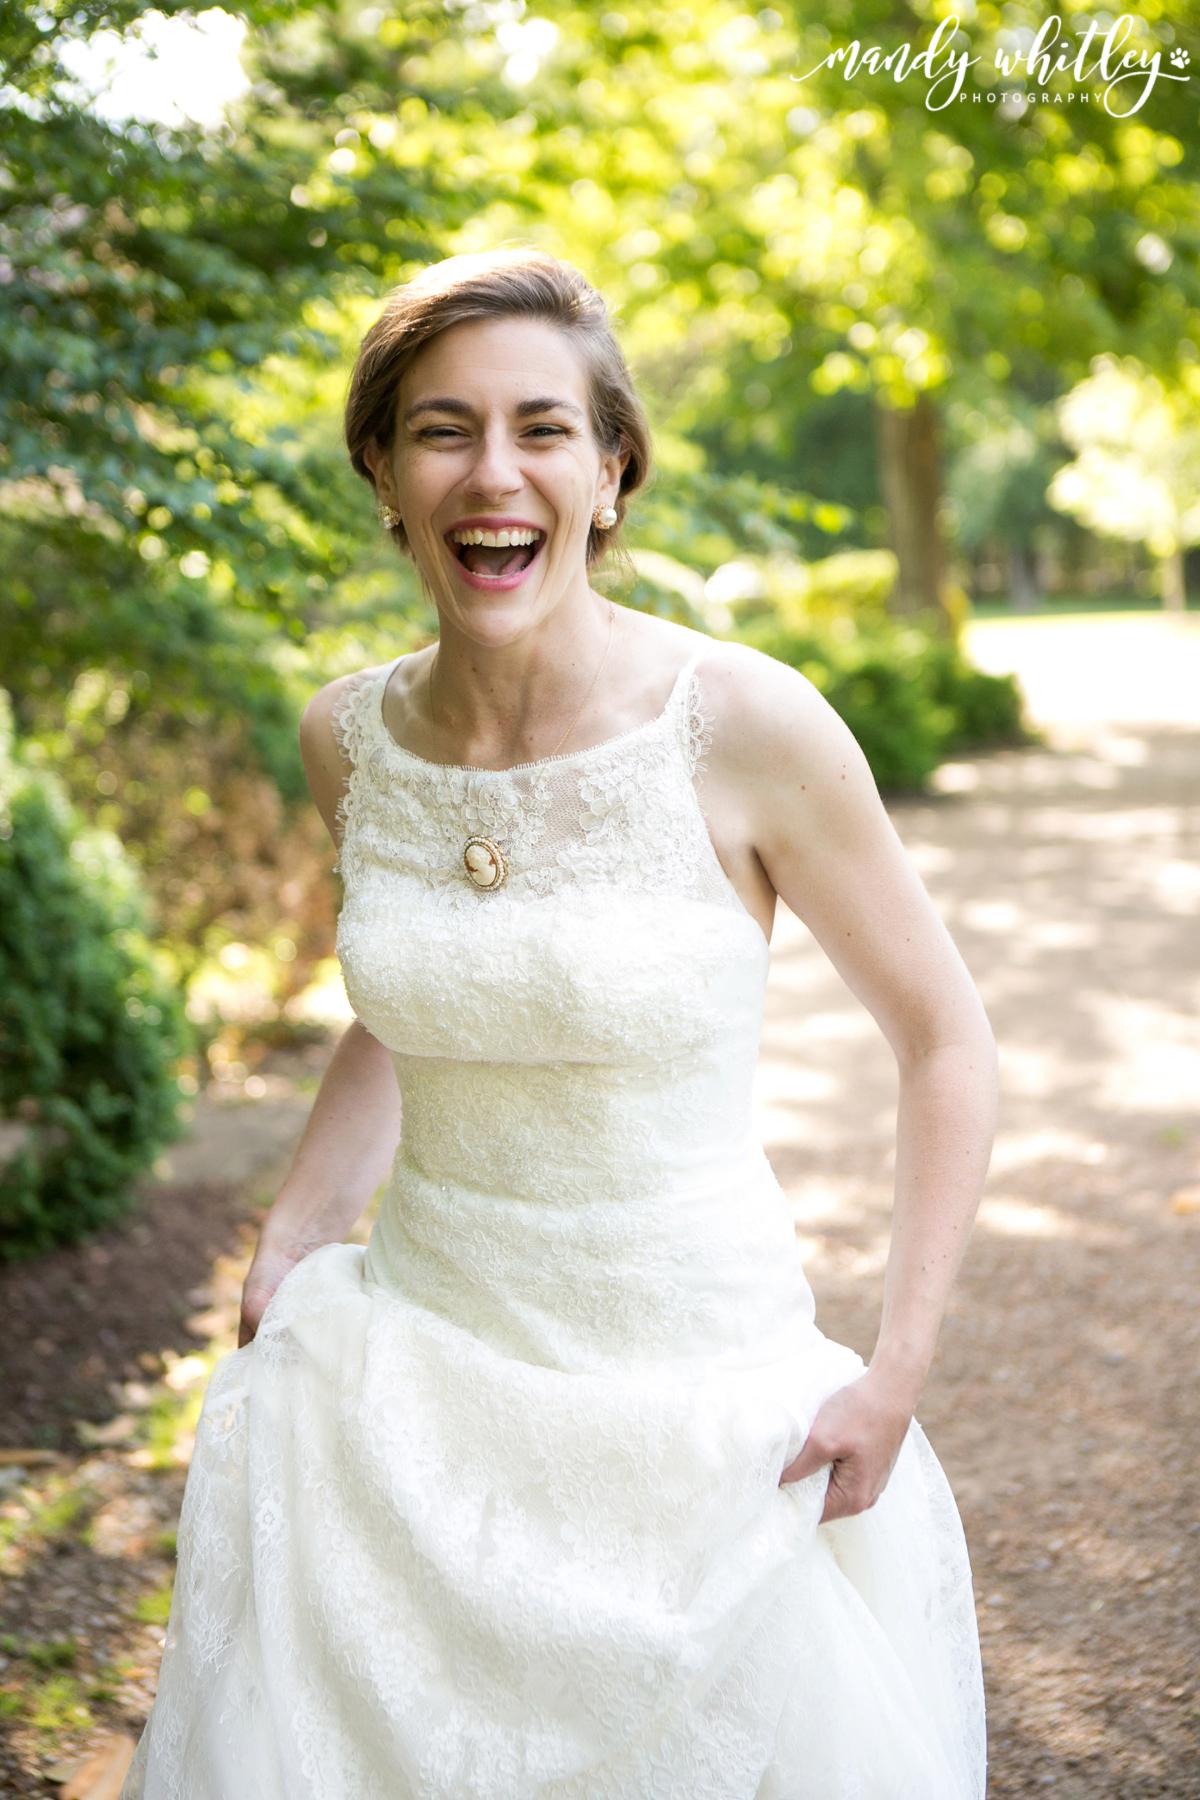 Nashville Wedding Photographer Mandy Whitley Photography_0002.jpg